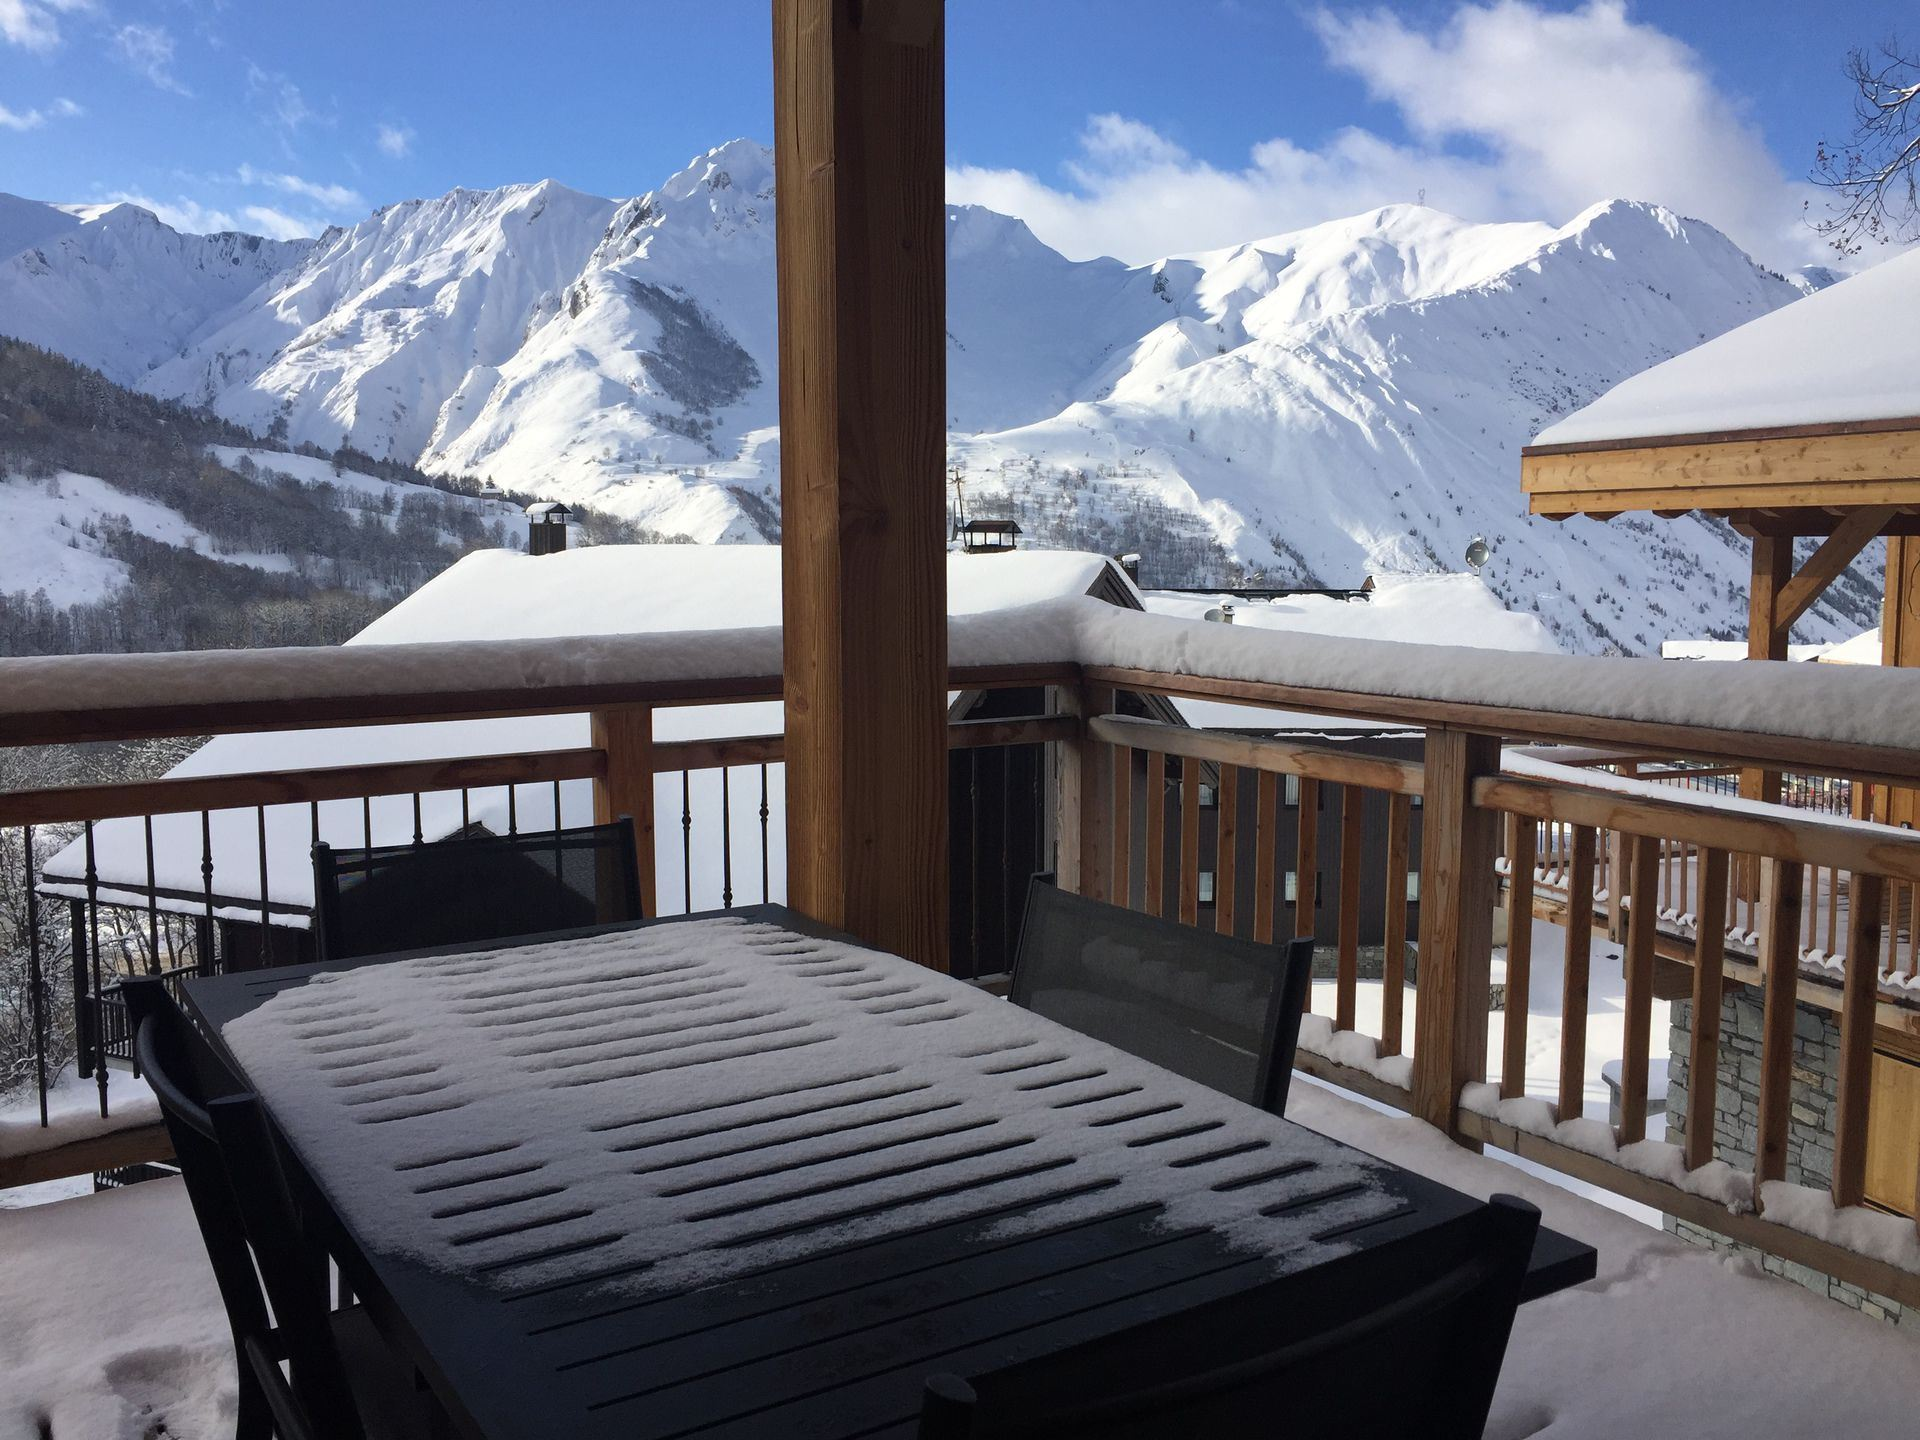 6 Room 10 Pers ski-in ski-out / CASEBLANCHE C23